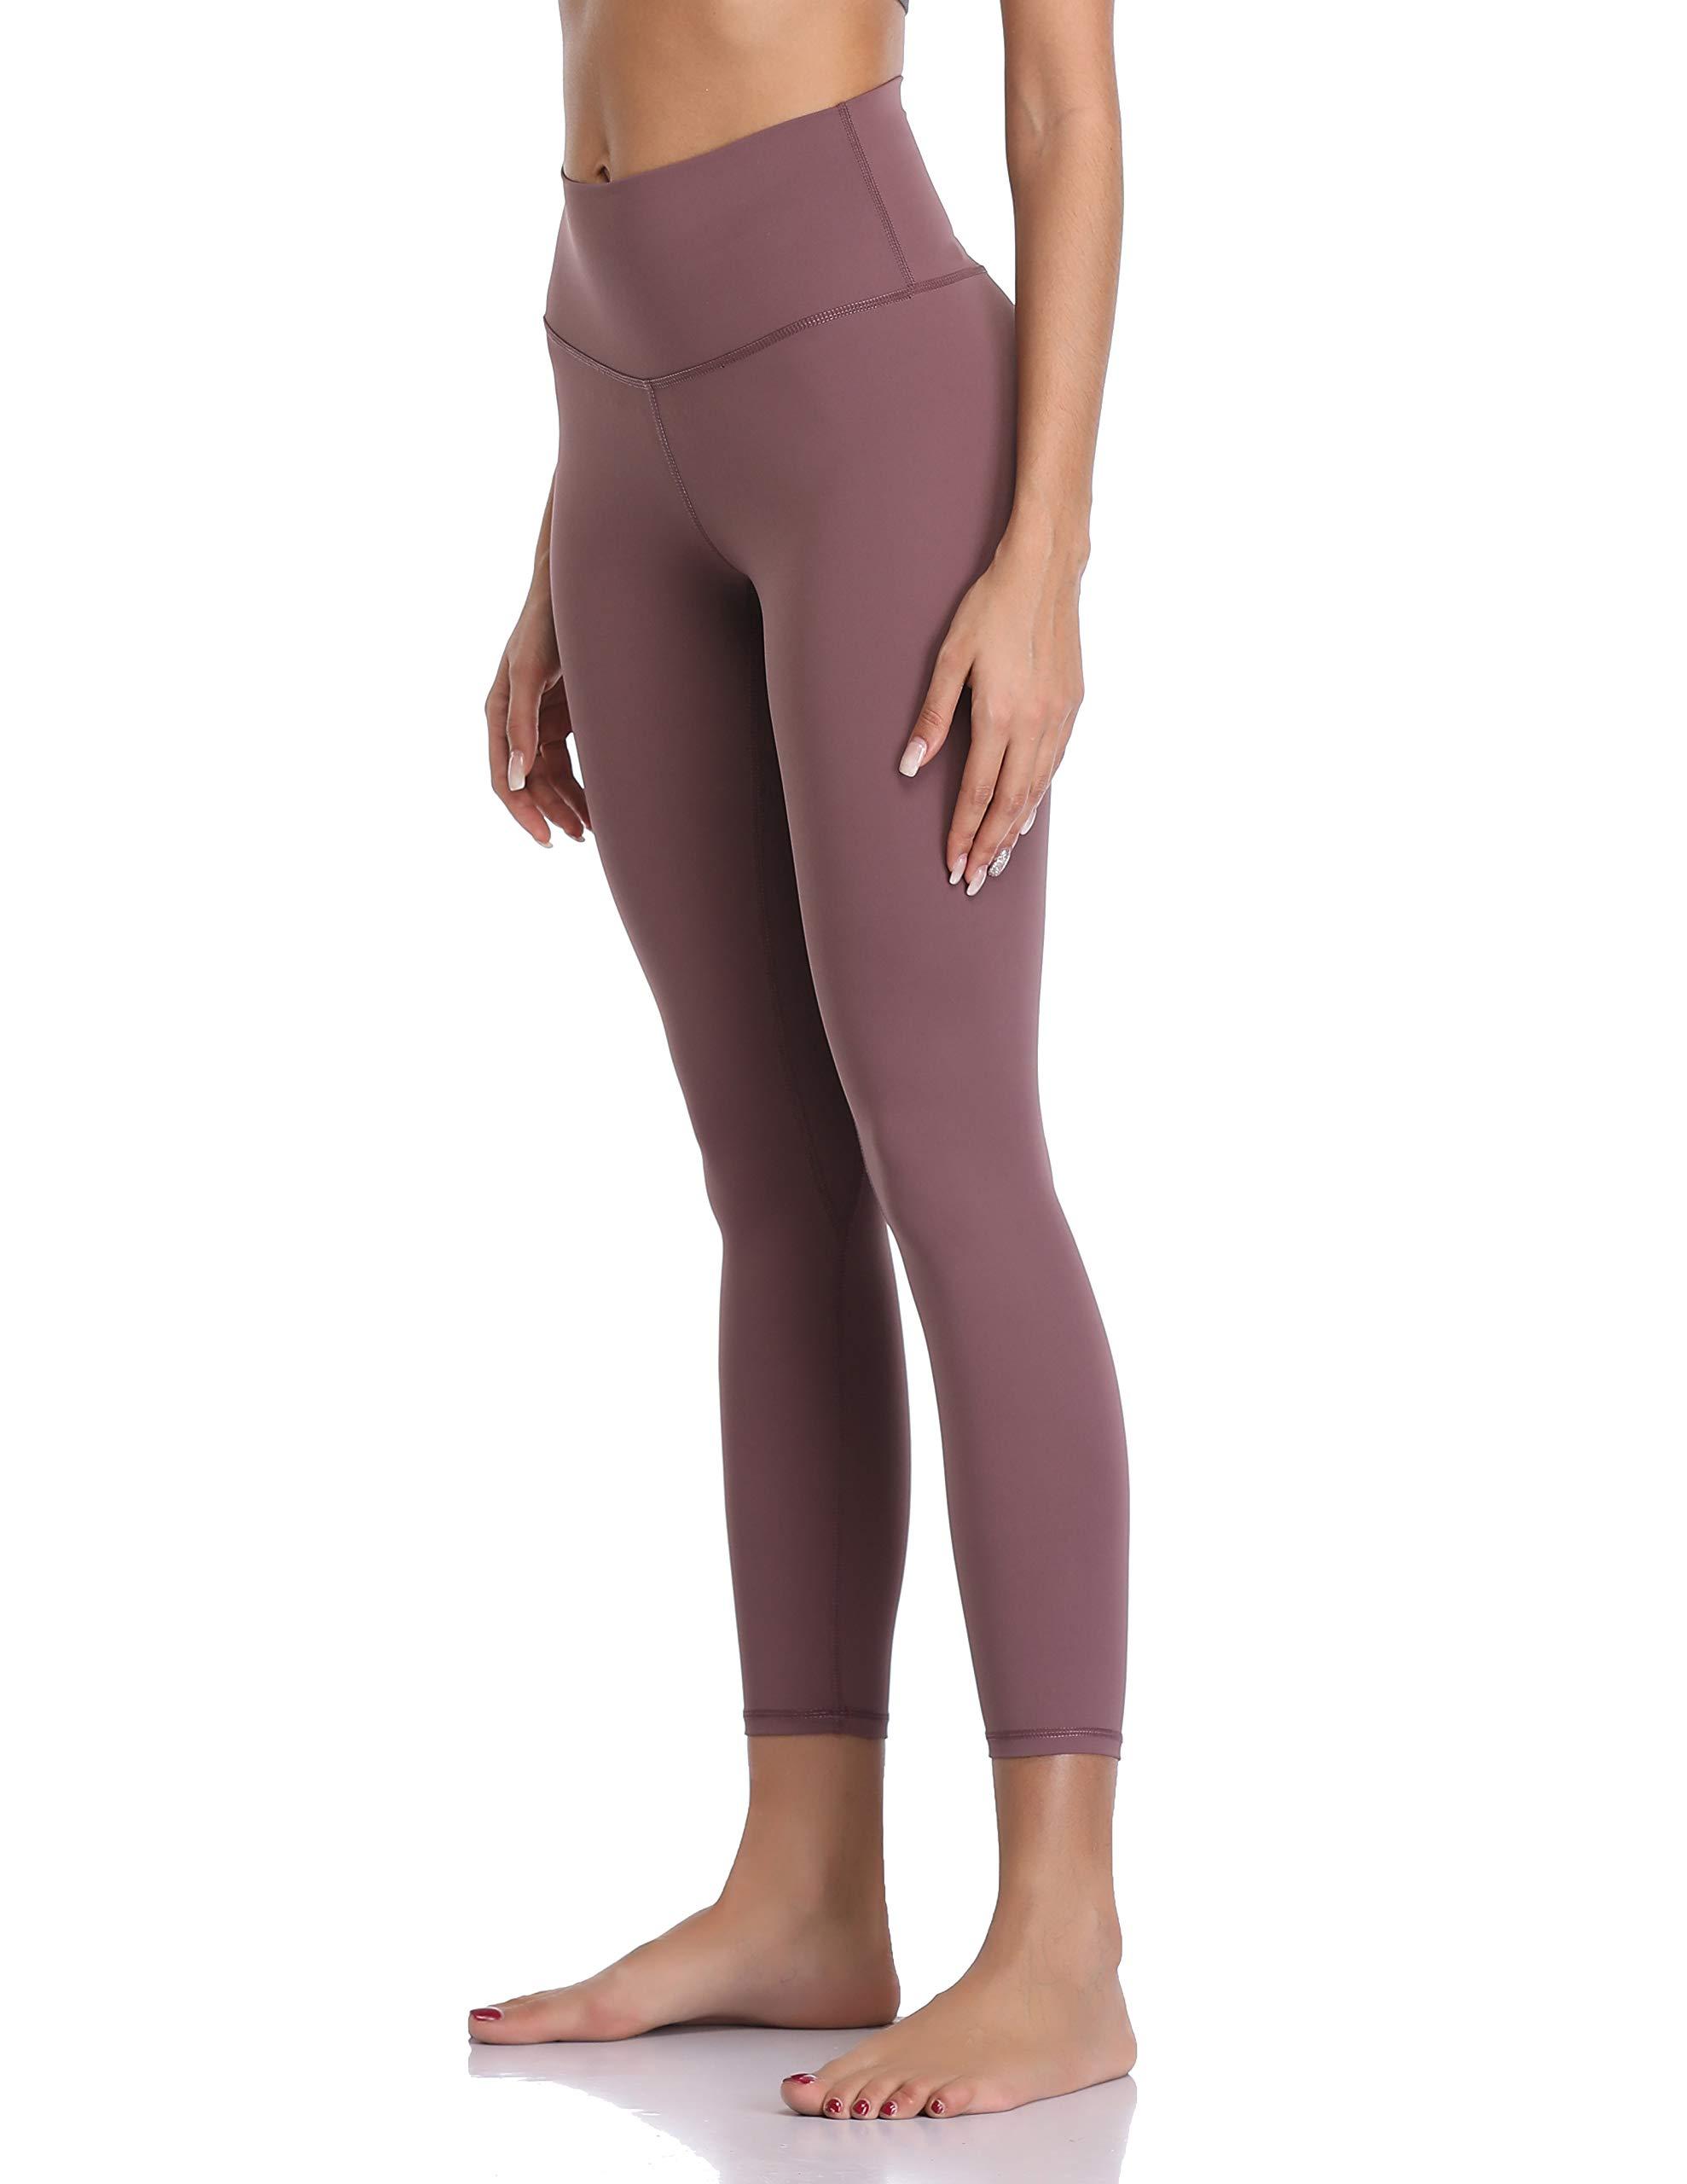 Colorfulkoala Women's Buttery Soft High Waisted Yoga Pants 7/8 Length Leggings (XL, Dusty Red) by Colorfulkoala